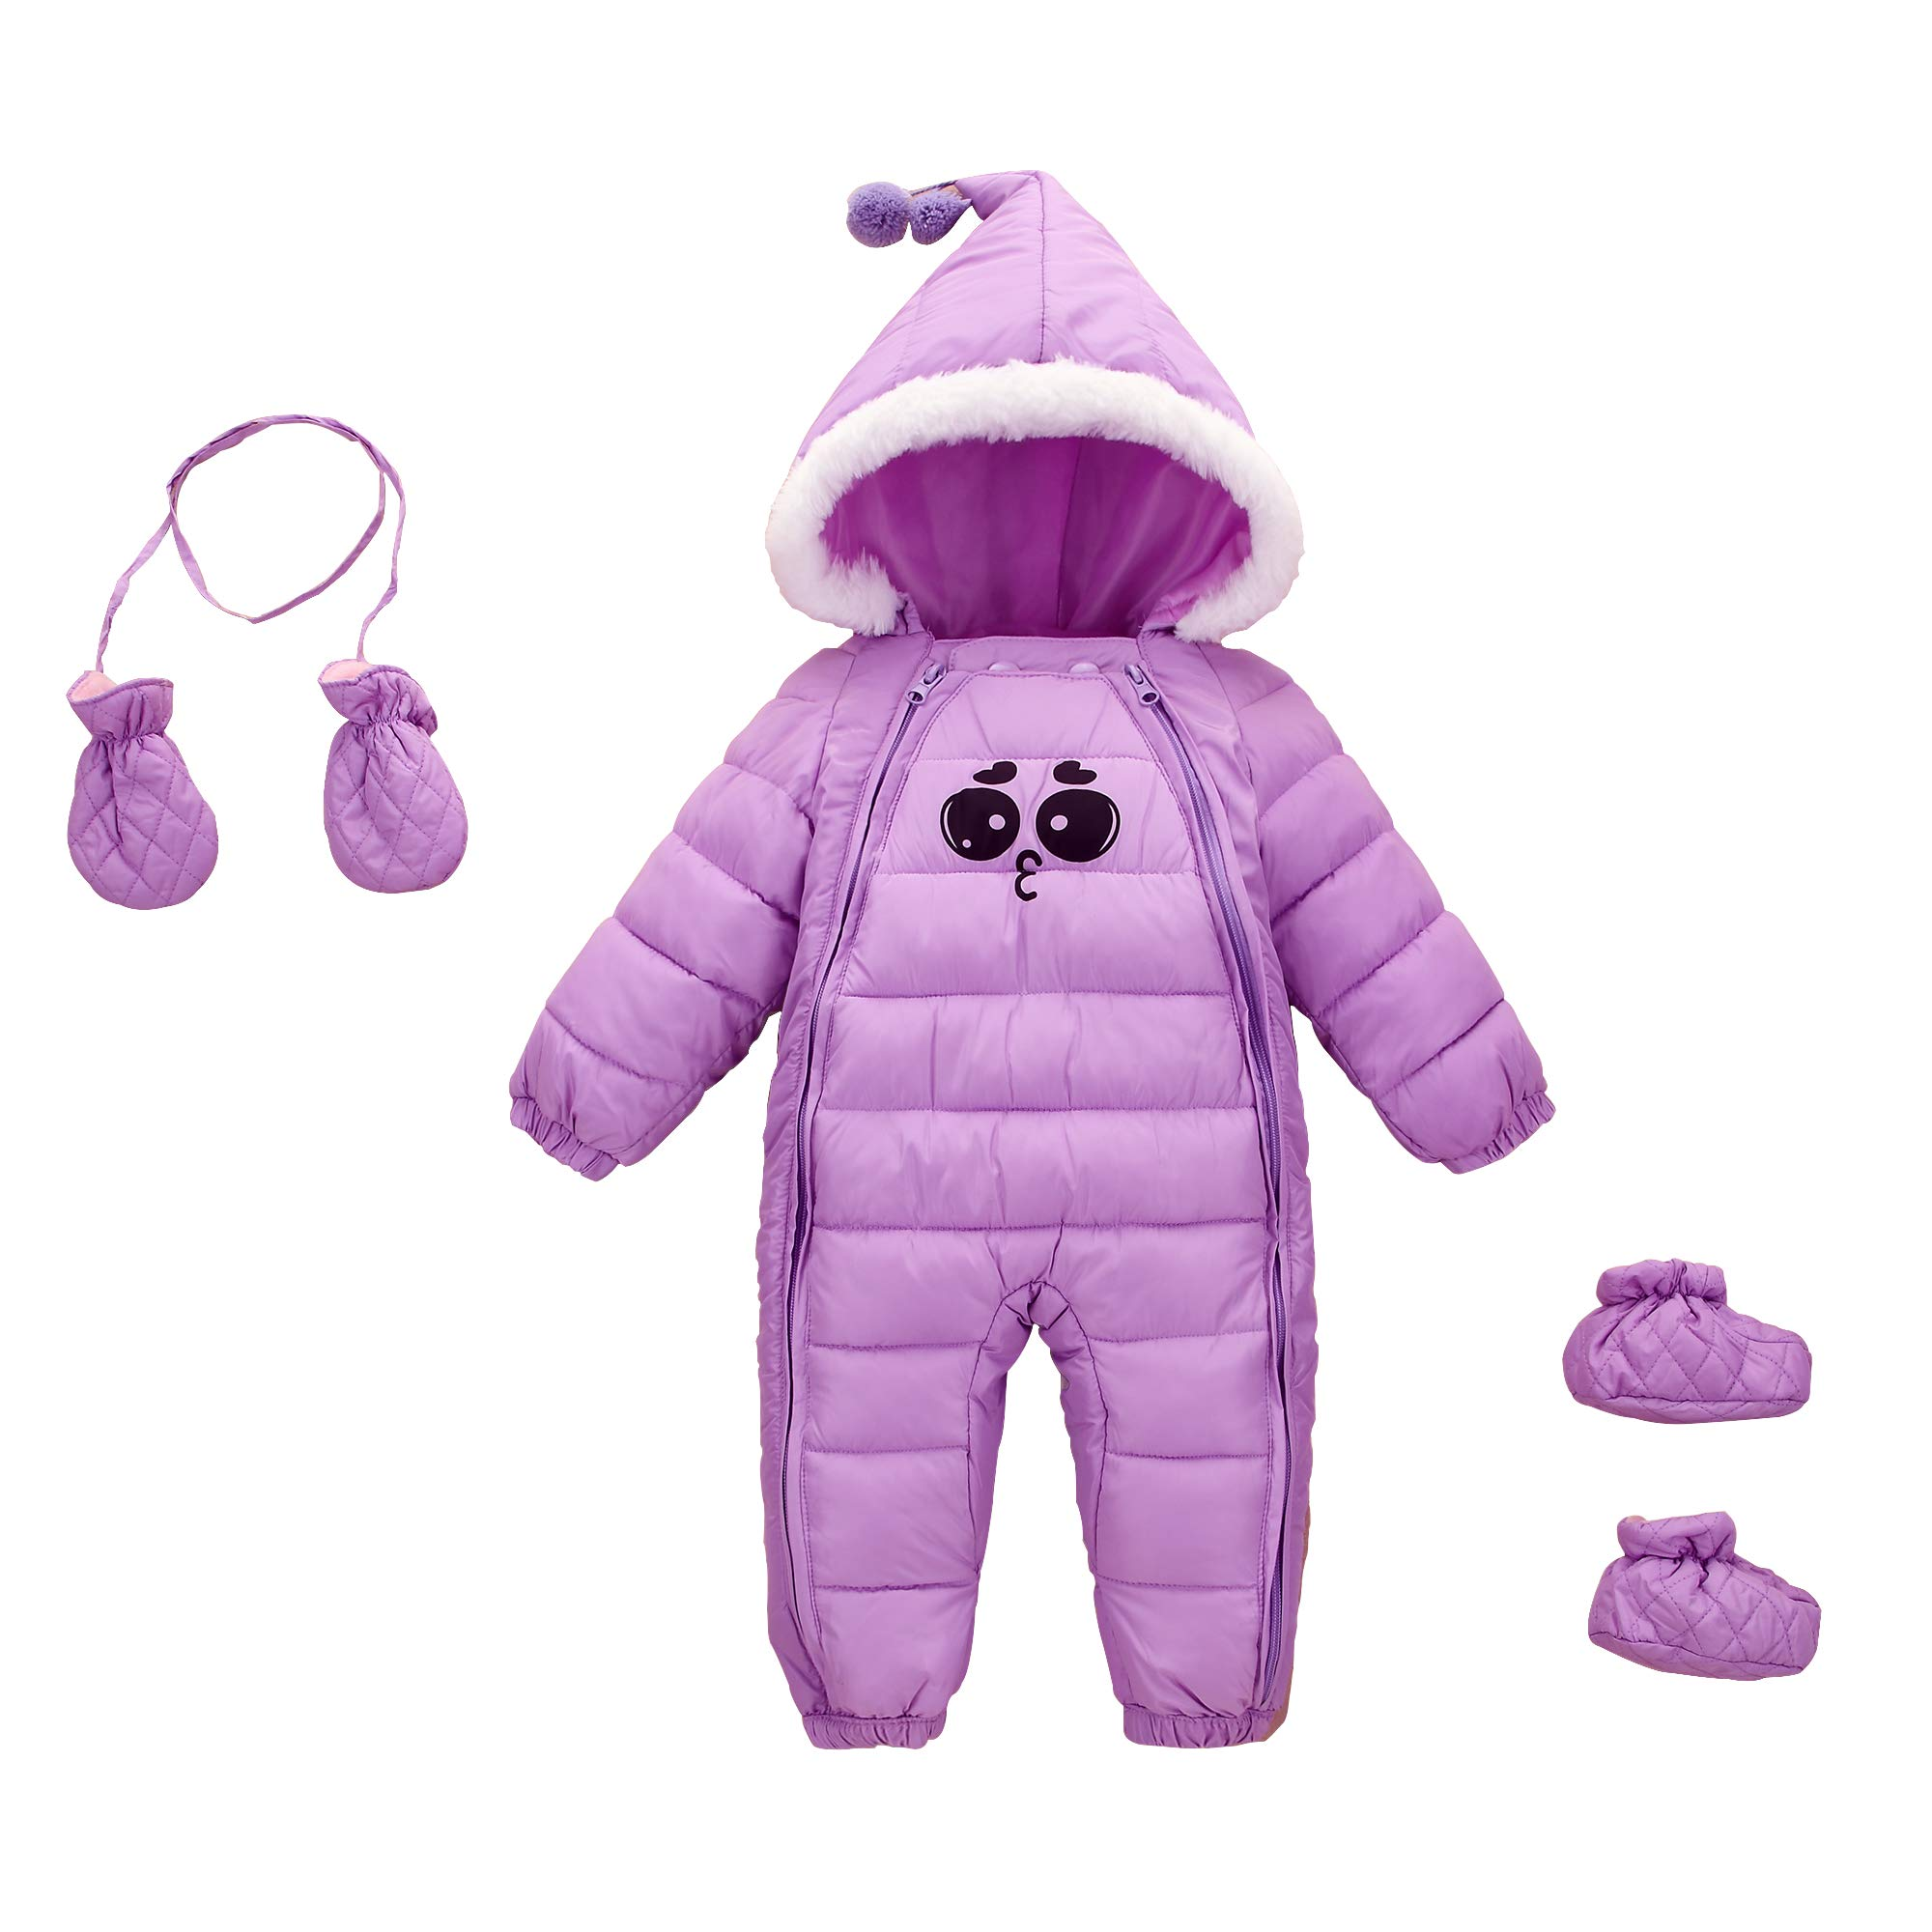 Toddler Winter Romper Jumpsuit Onesies Baby Girls Hoodie Down Cotton Snowsuit All in One Down Coat 12-24 Months Purple by Mumuzhu